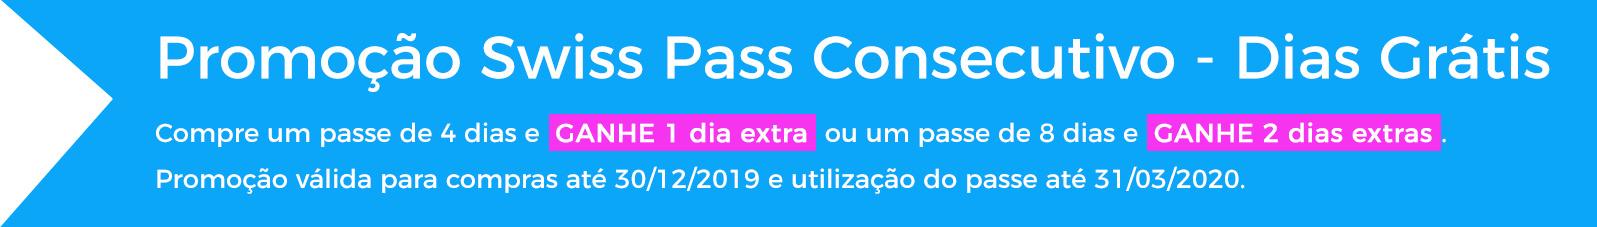 promocao-swiss-pass-consecutivo